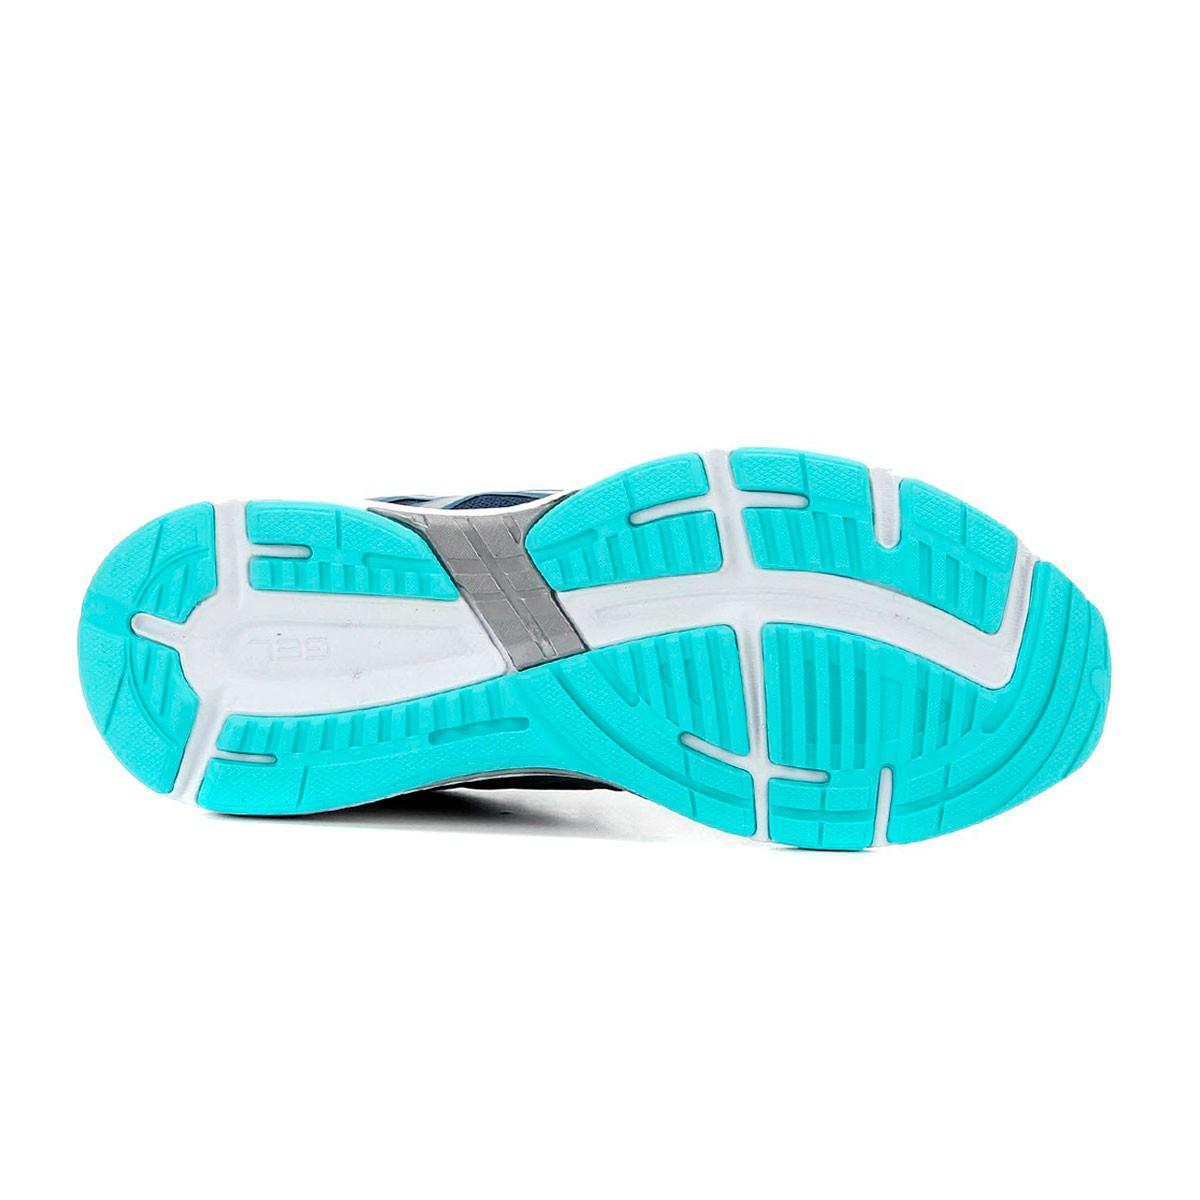 Tênis Asics Gel-Exalt 5A Feminino Azul Escuro